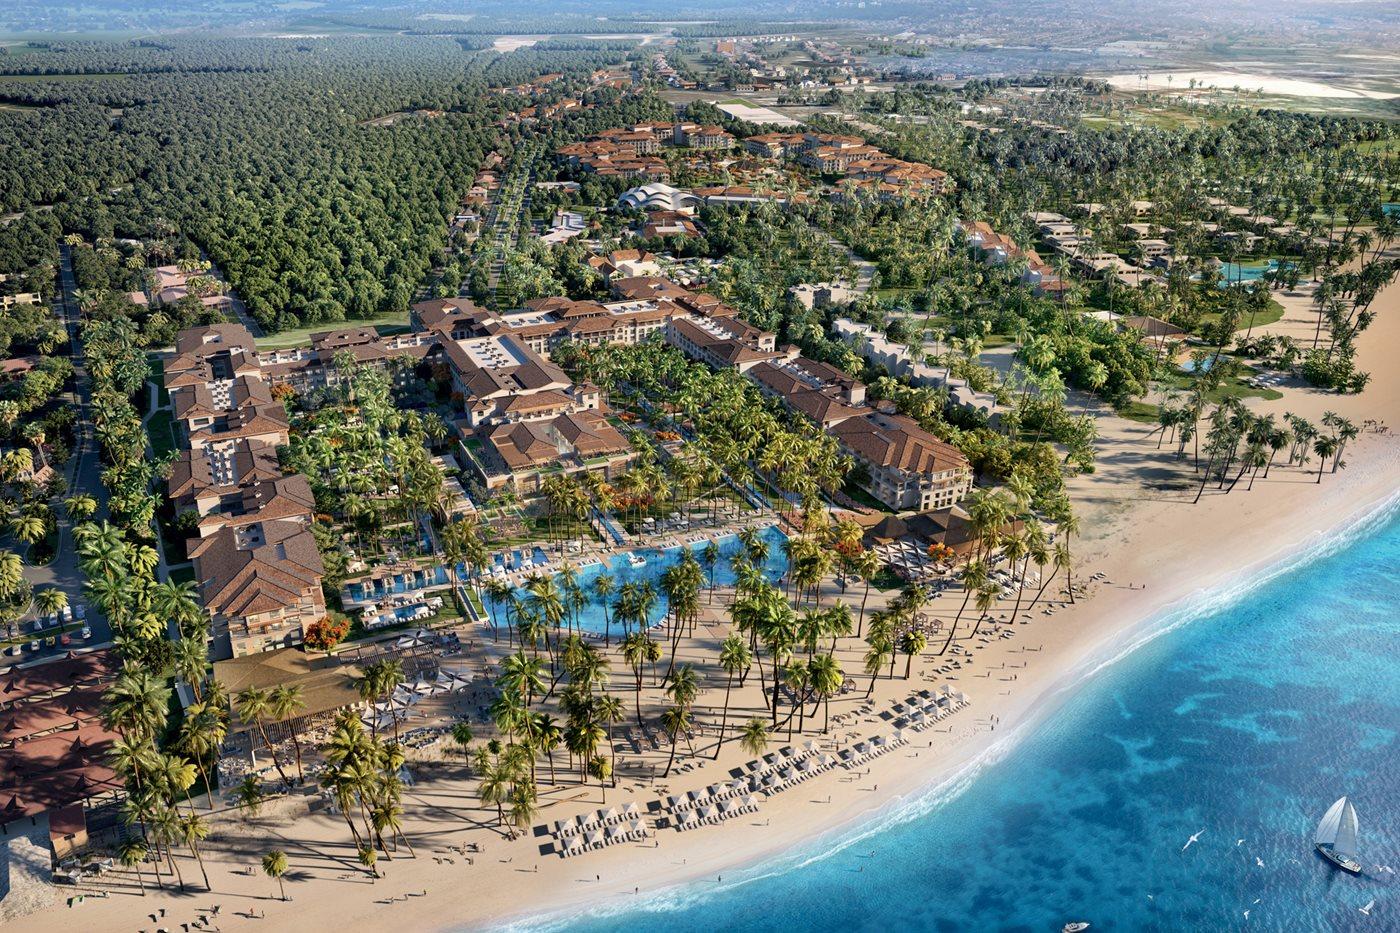 PUJ-Lopesan-Costa-Bavaro-Resort-Spa-Casino-Aerial-001